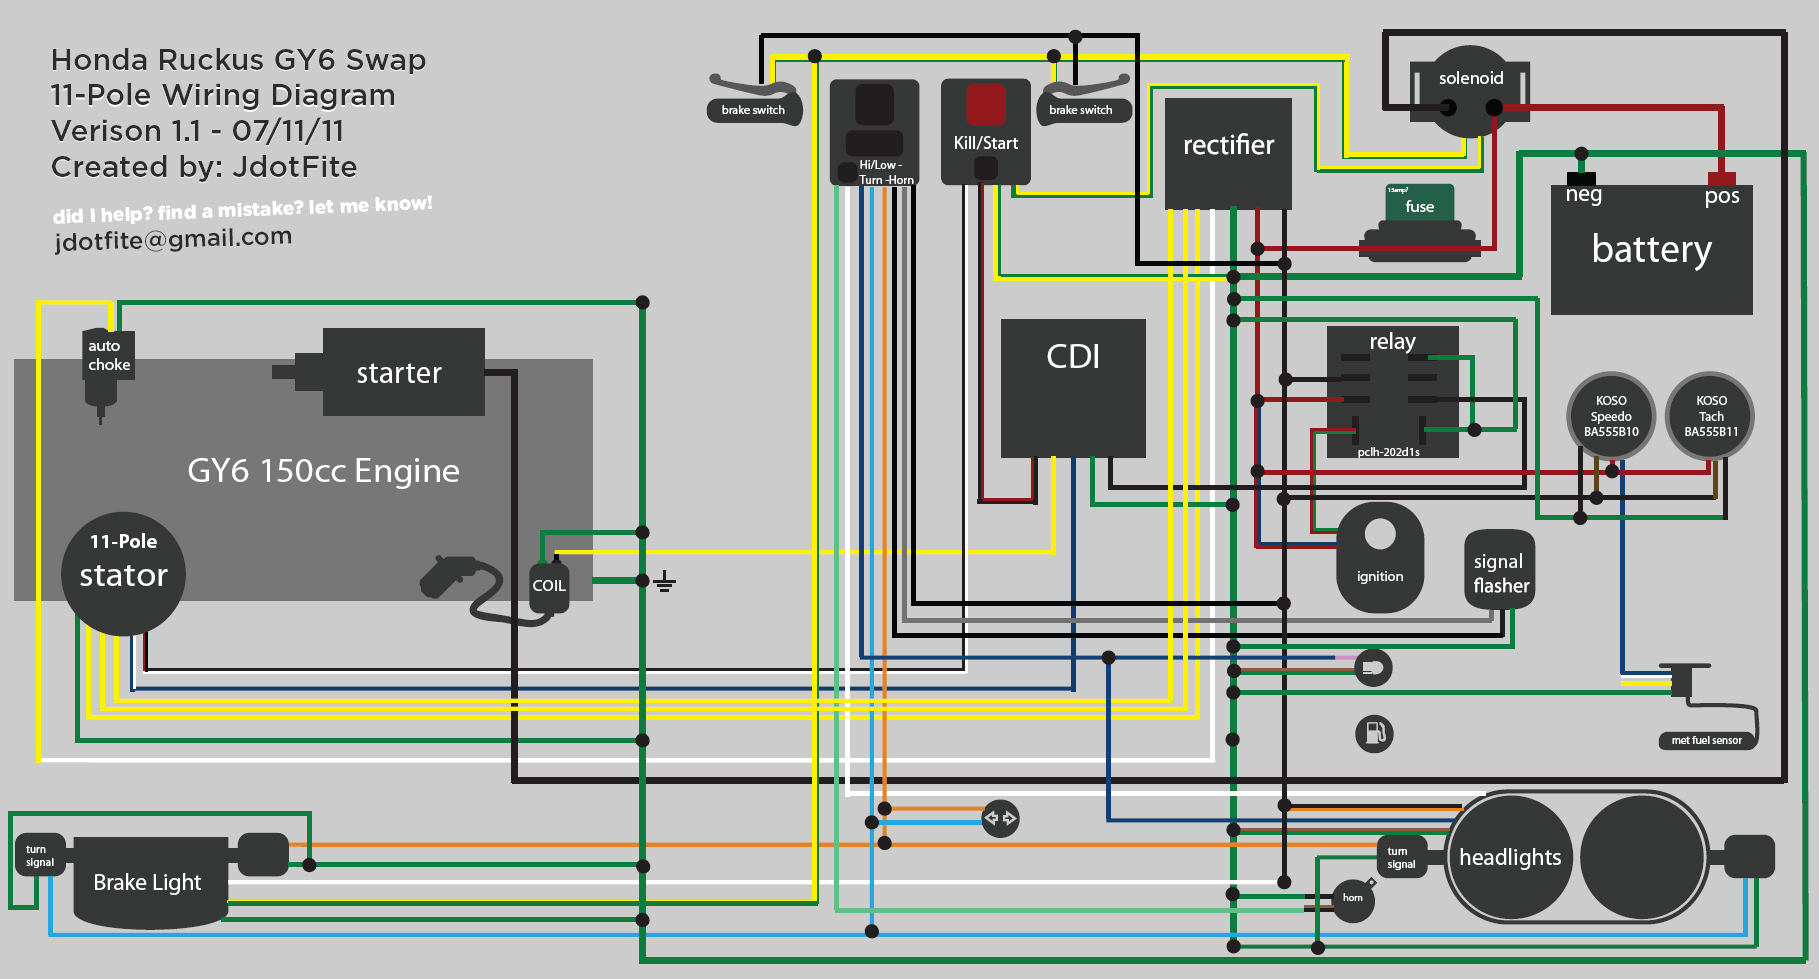 Shineray Atv Wiring Harness Diagram | Wiring Diagram - Chinese Atv Wiring Harness Diagram